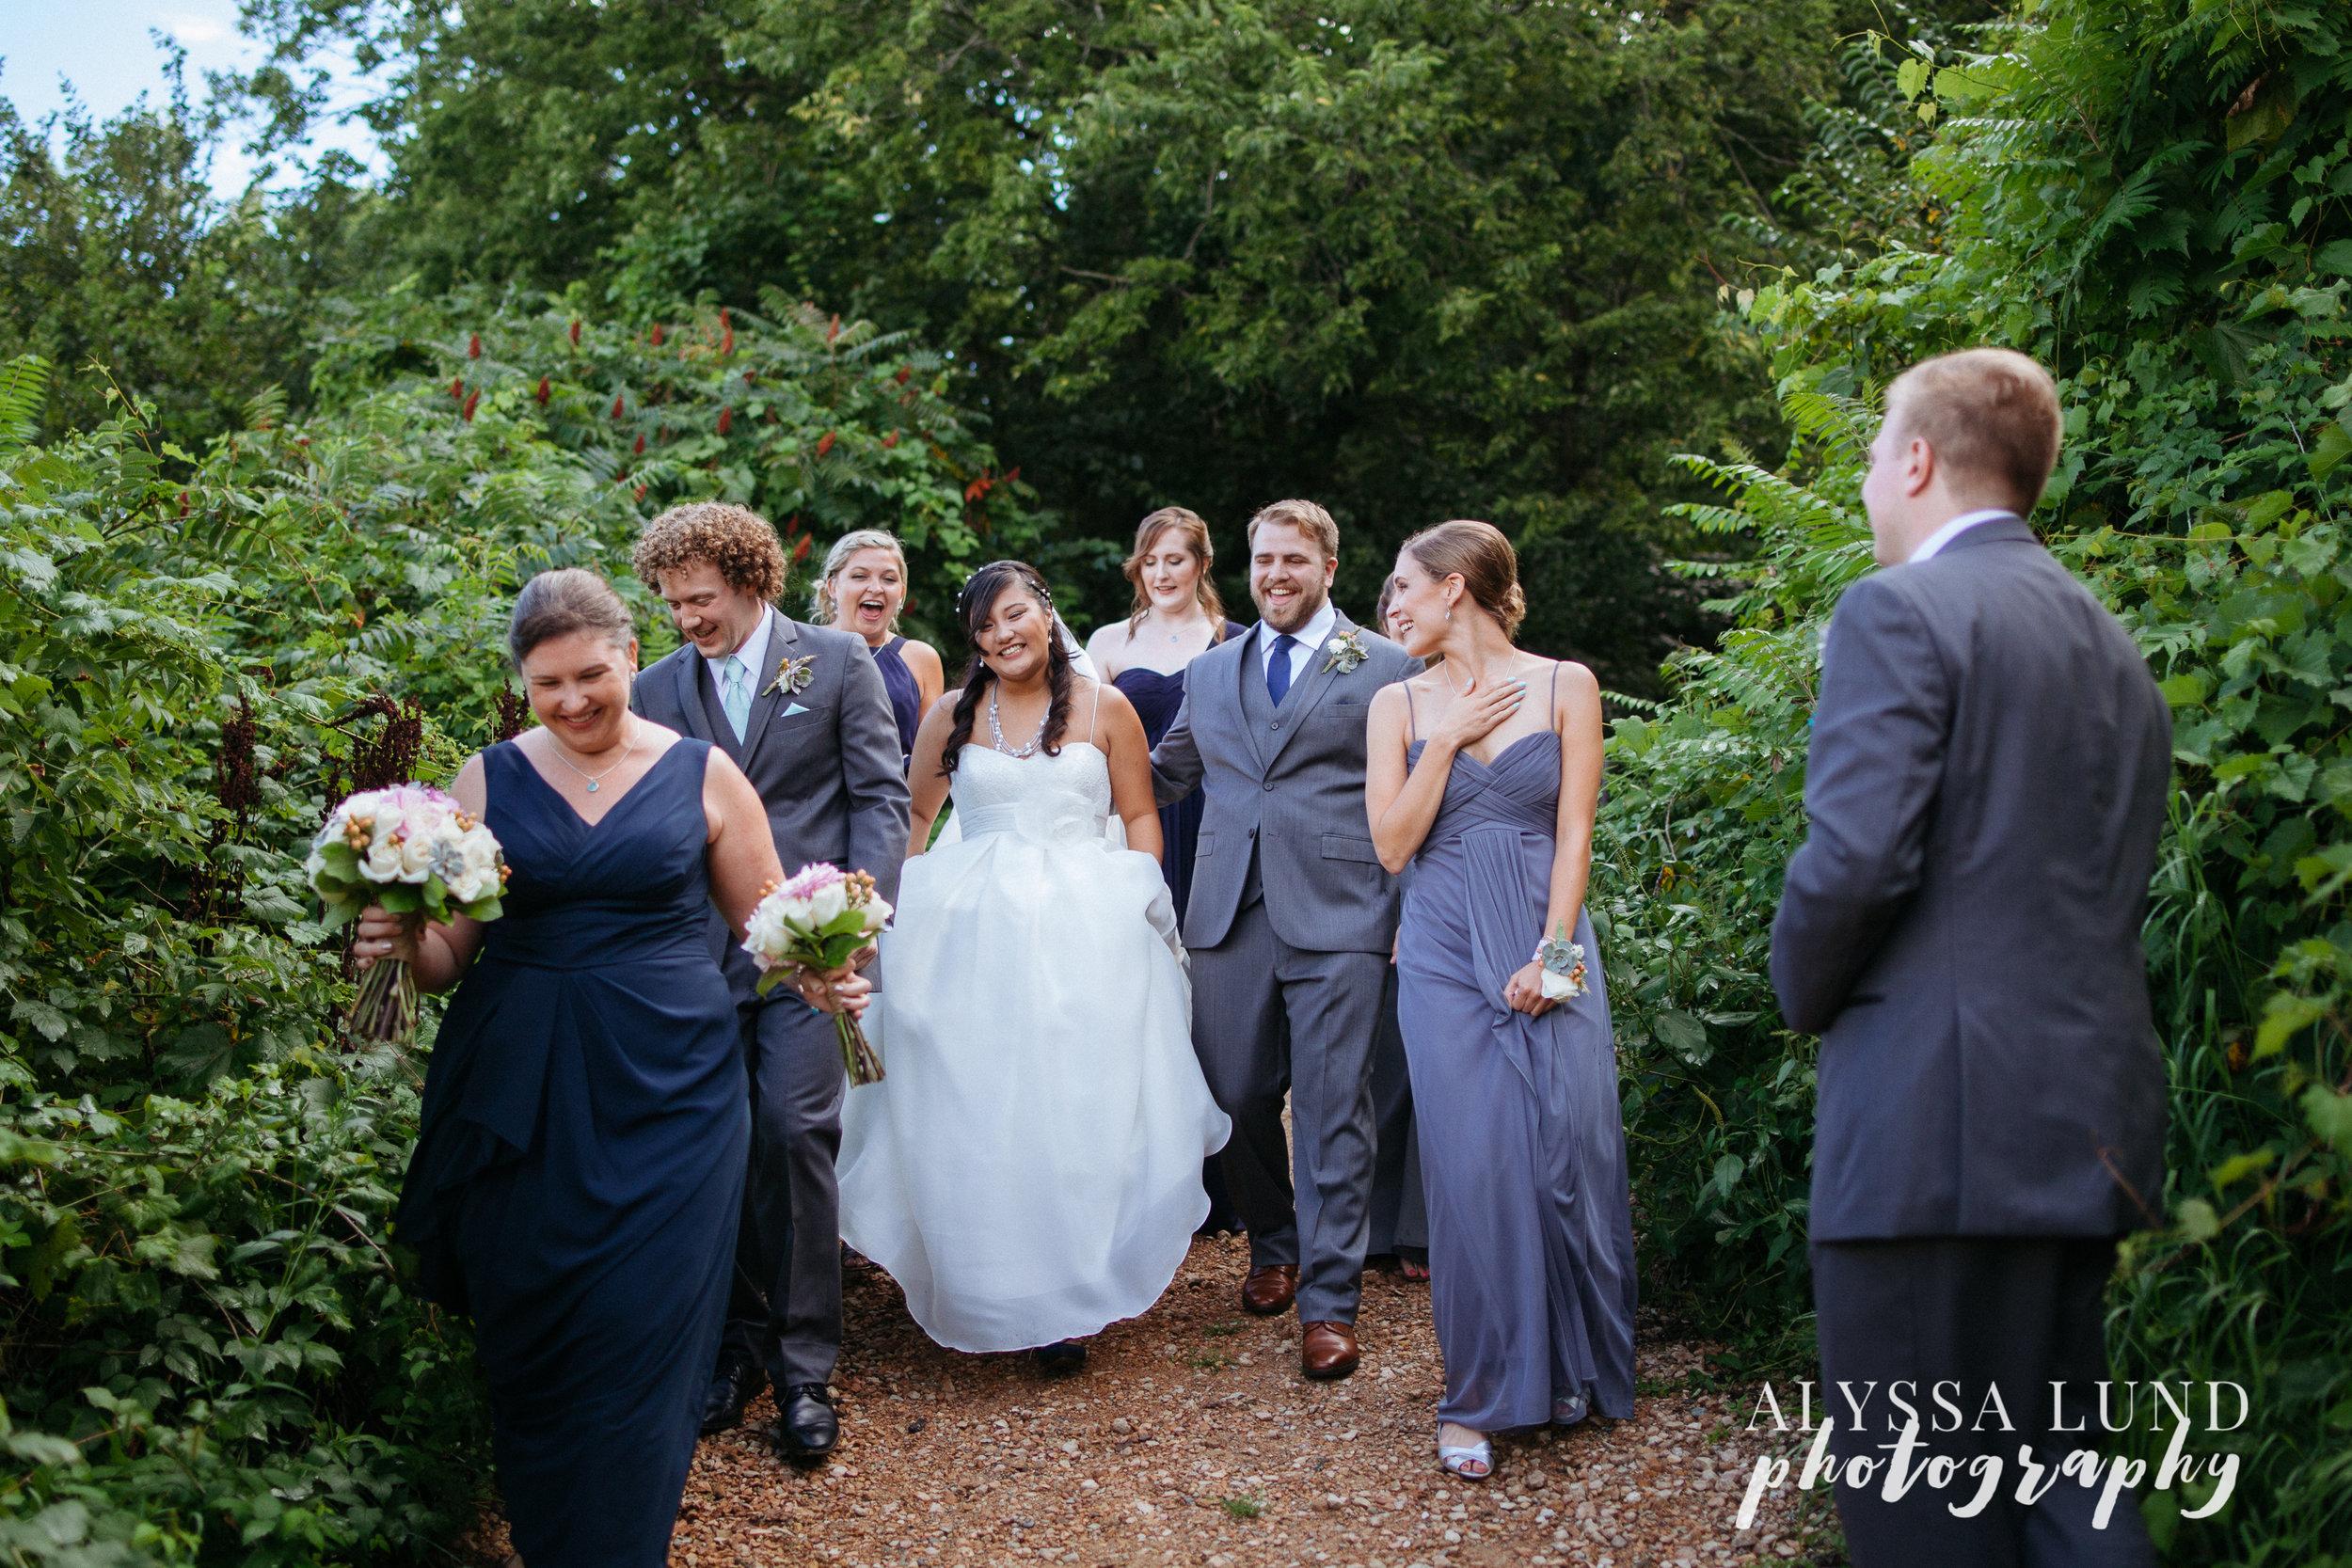 Outdoor Minnesota Wedding Walking with Wedding Party